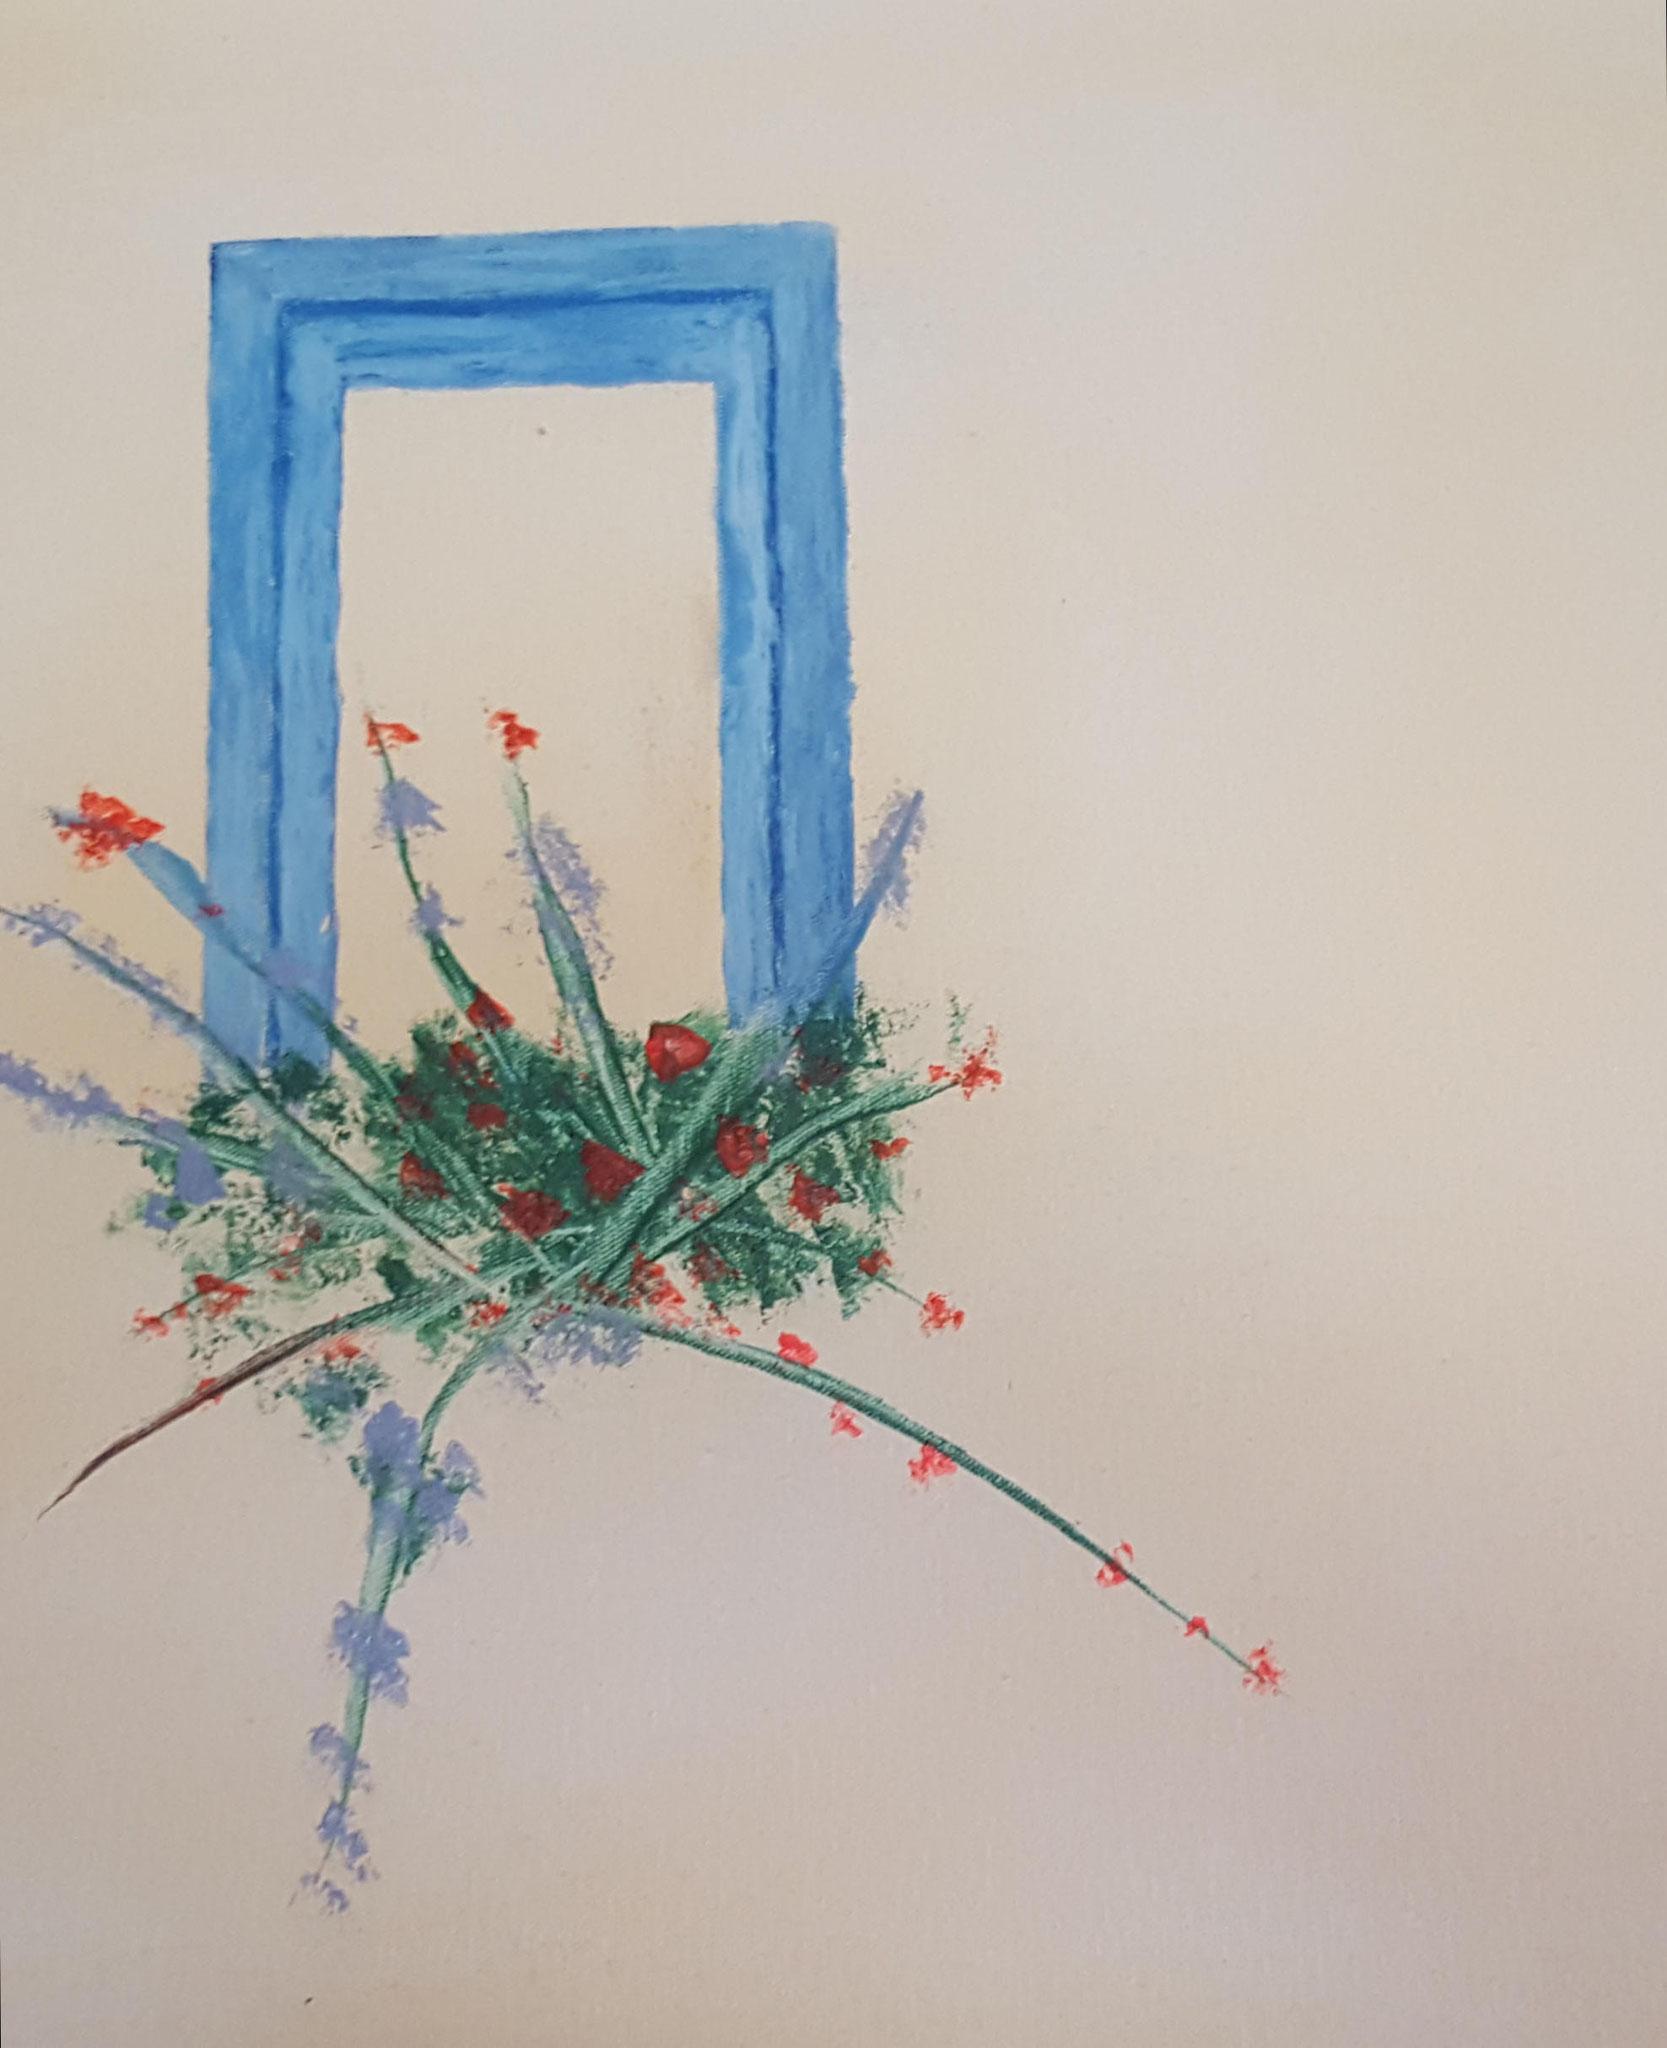 Nr. 20 - Fenster  50x40cm - 300 €